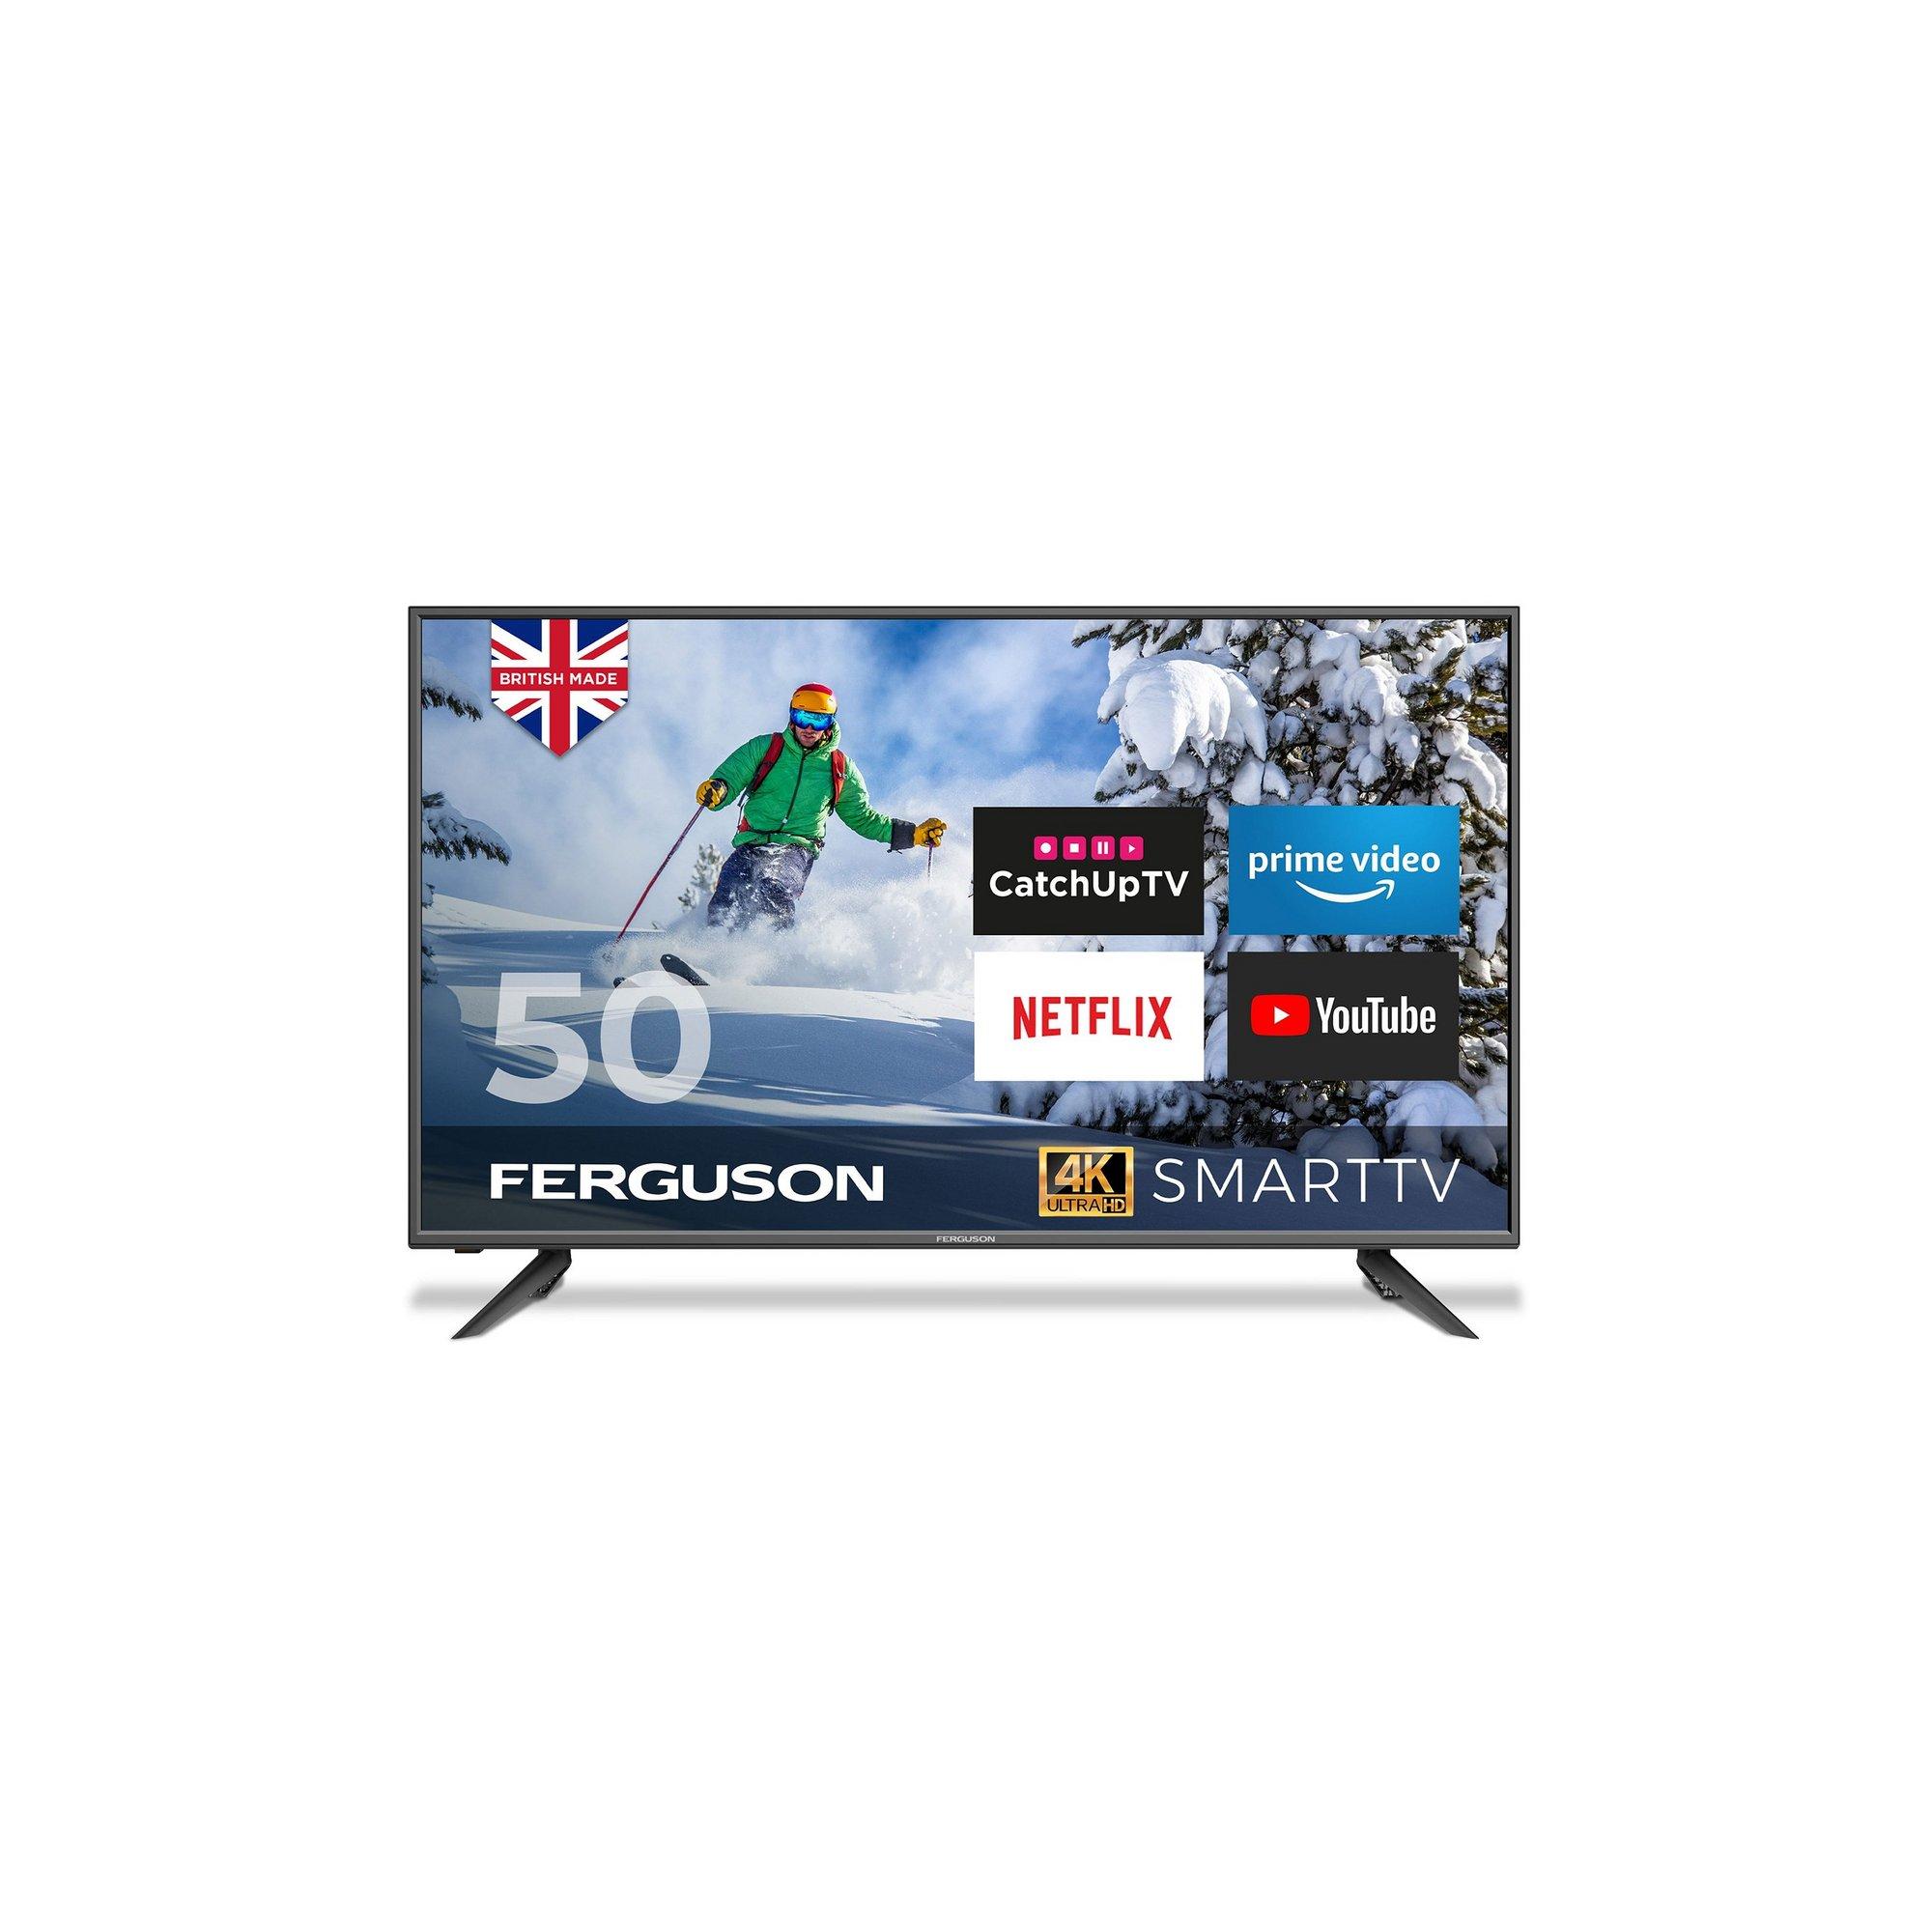 Image of Ferguson 50 inch F50RTS4K UHD Smart TV